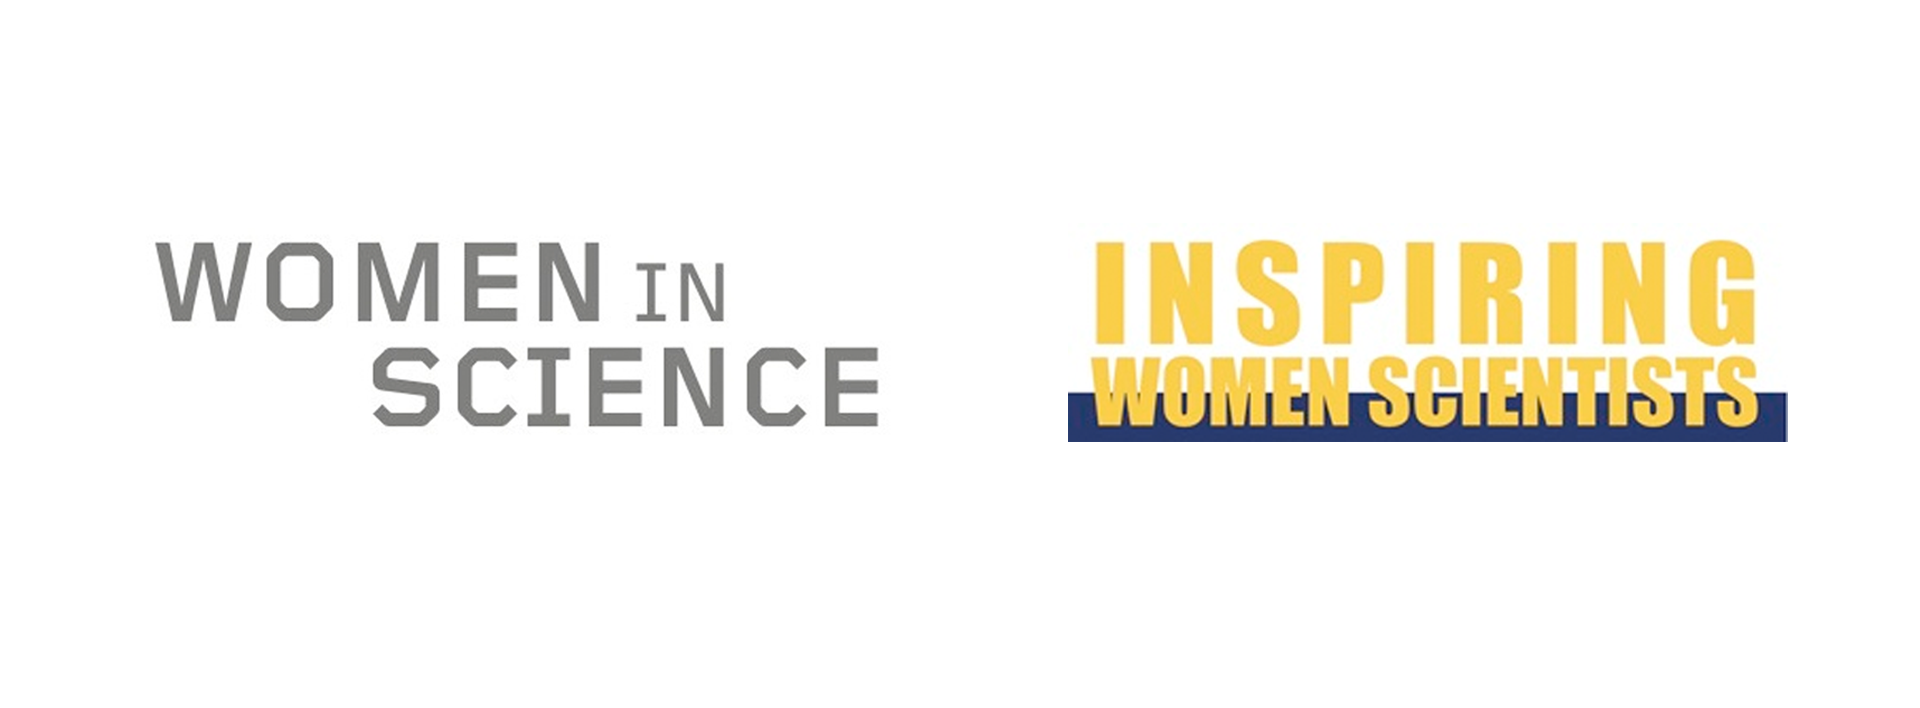 inspiring-women-in-science